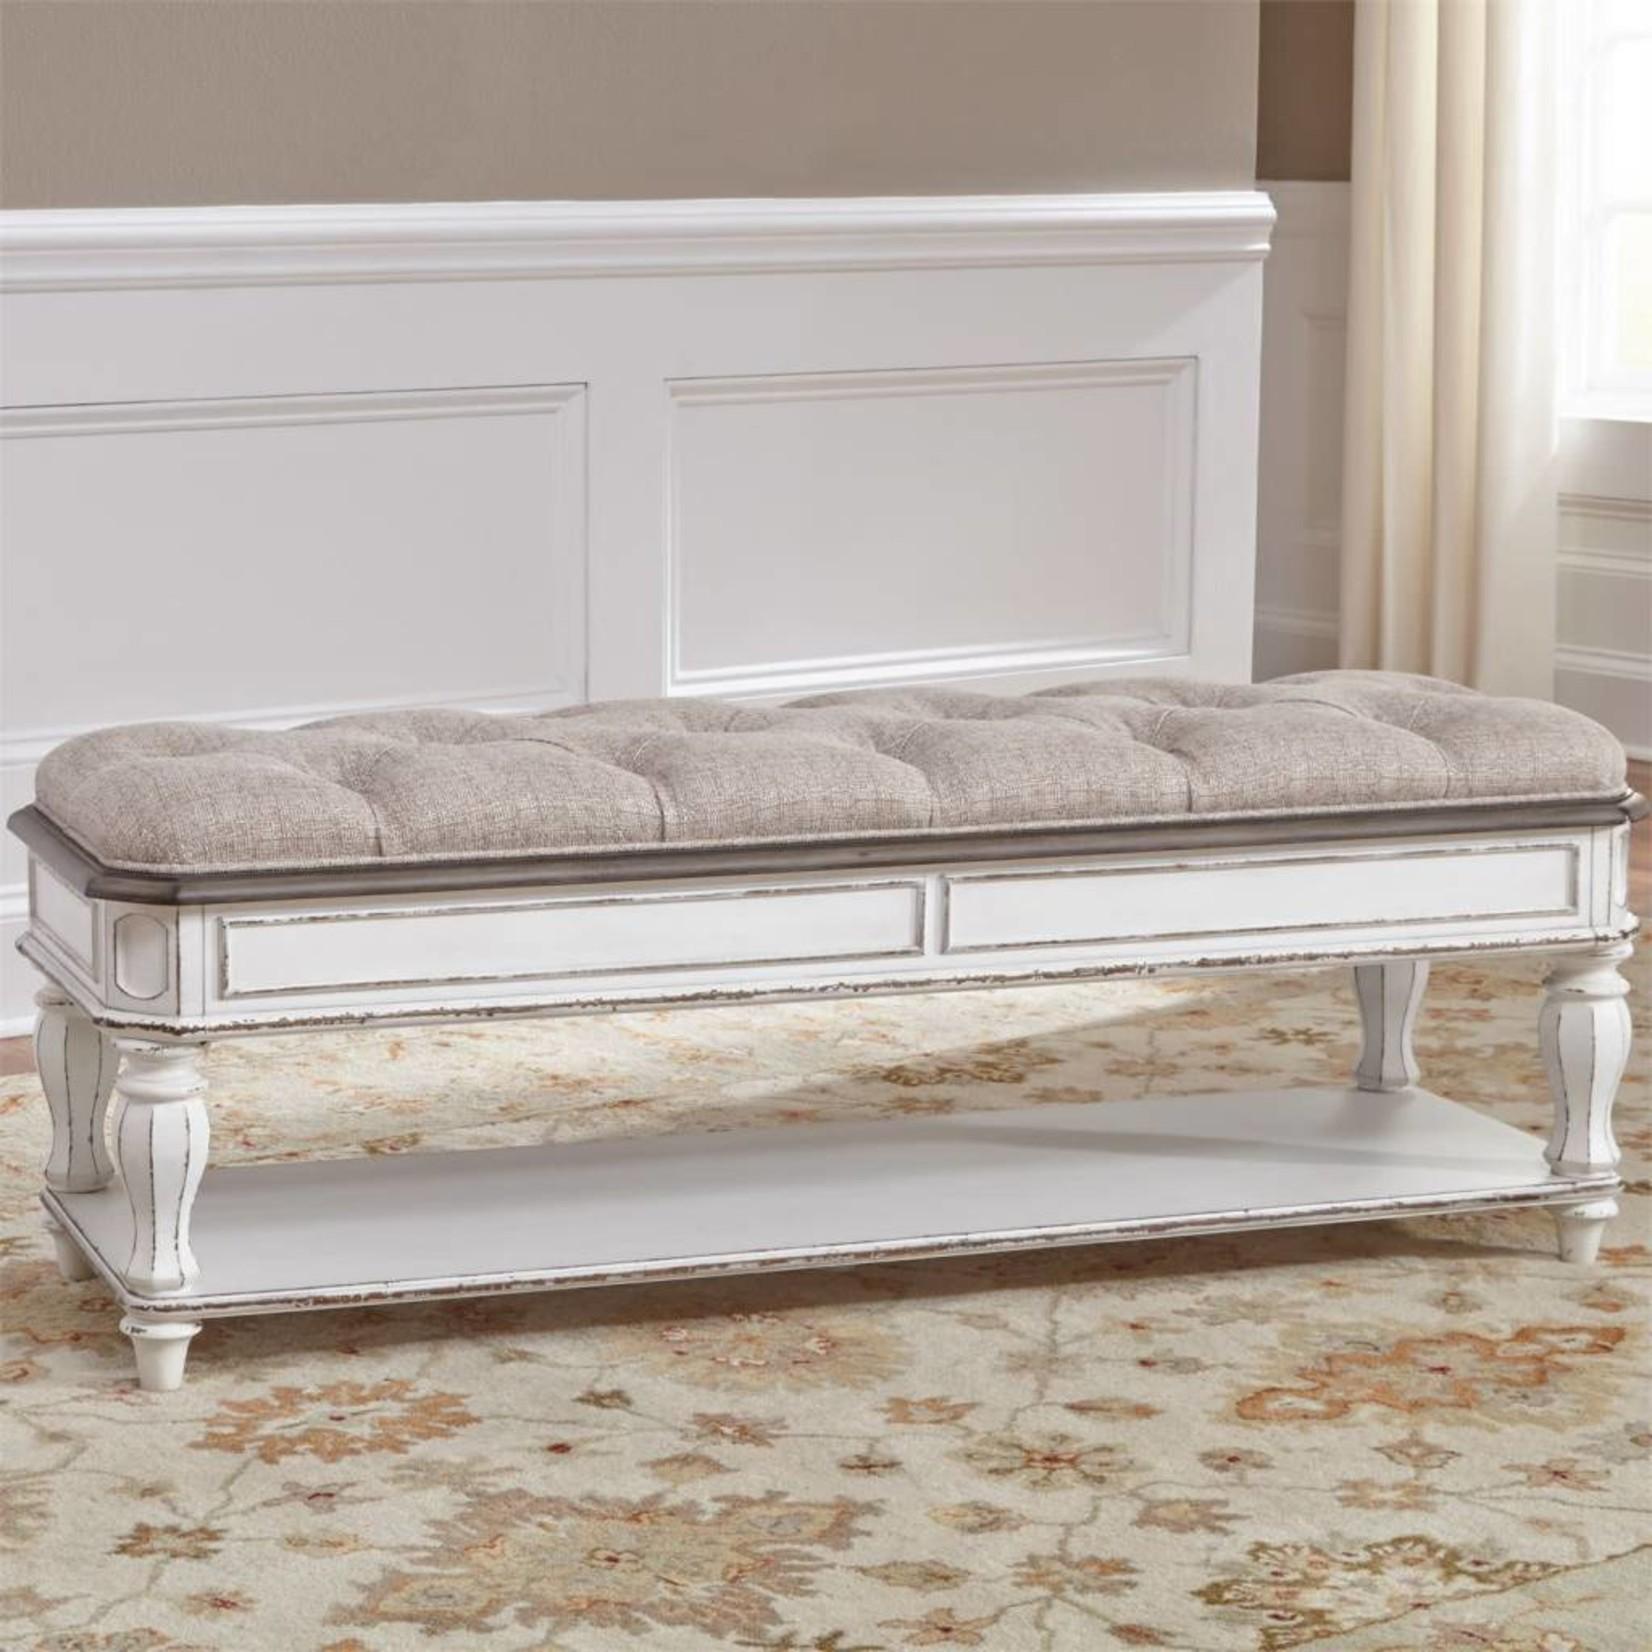 Magnolia Manor Bed Bench